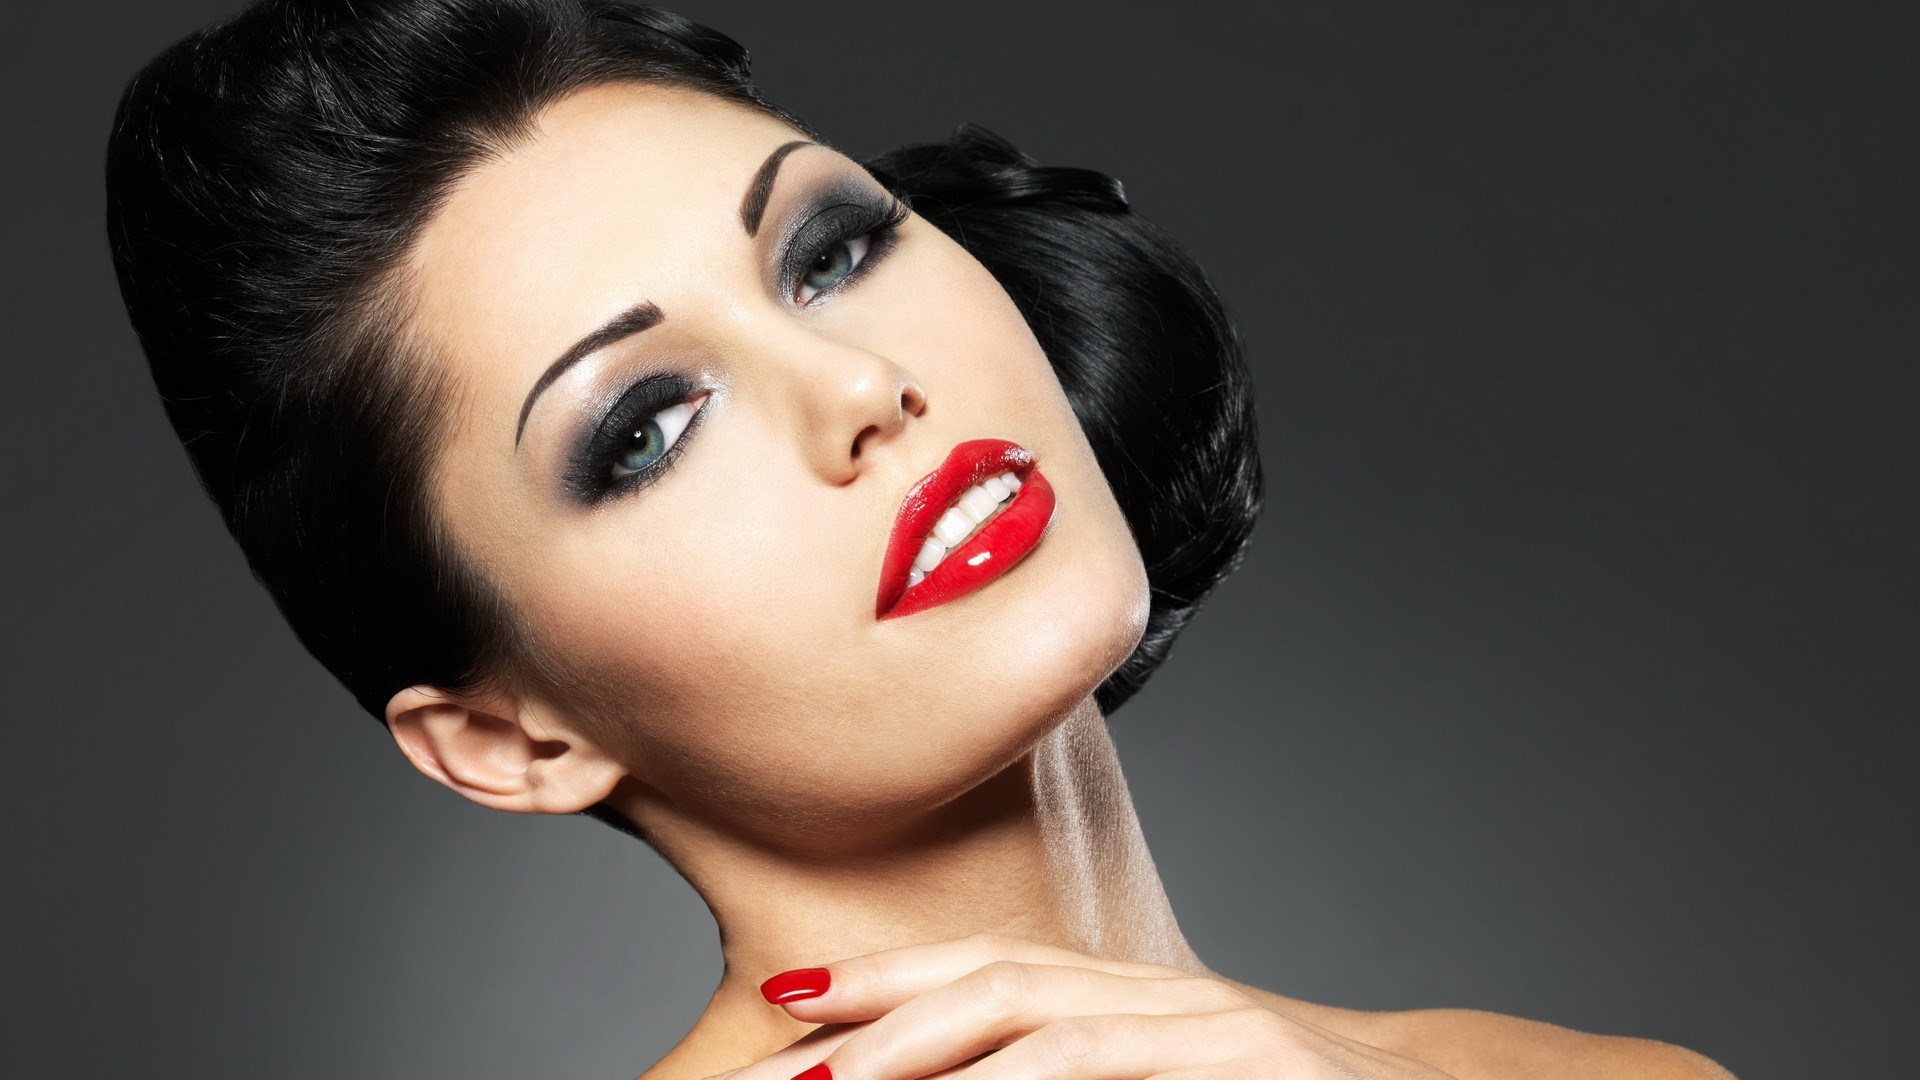 Makeup Brunette Woman